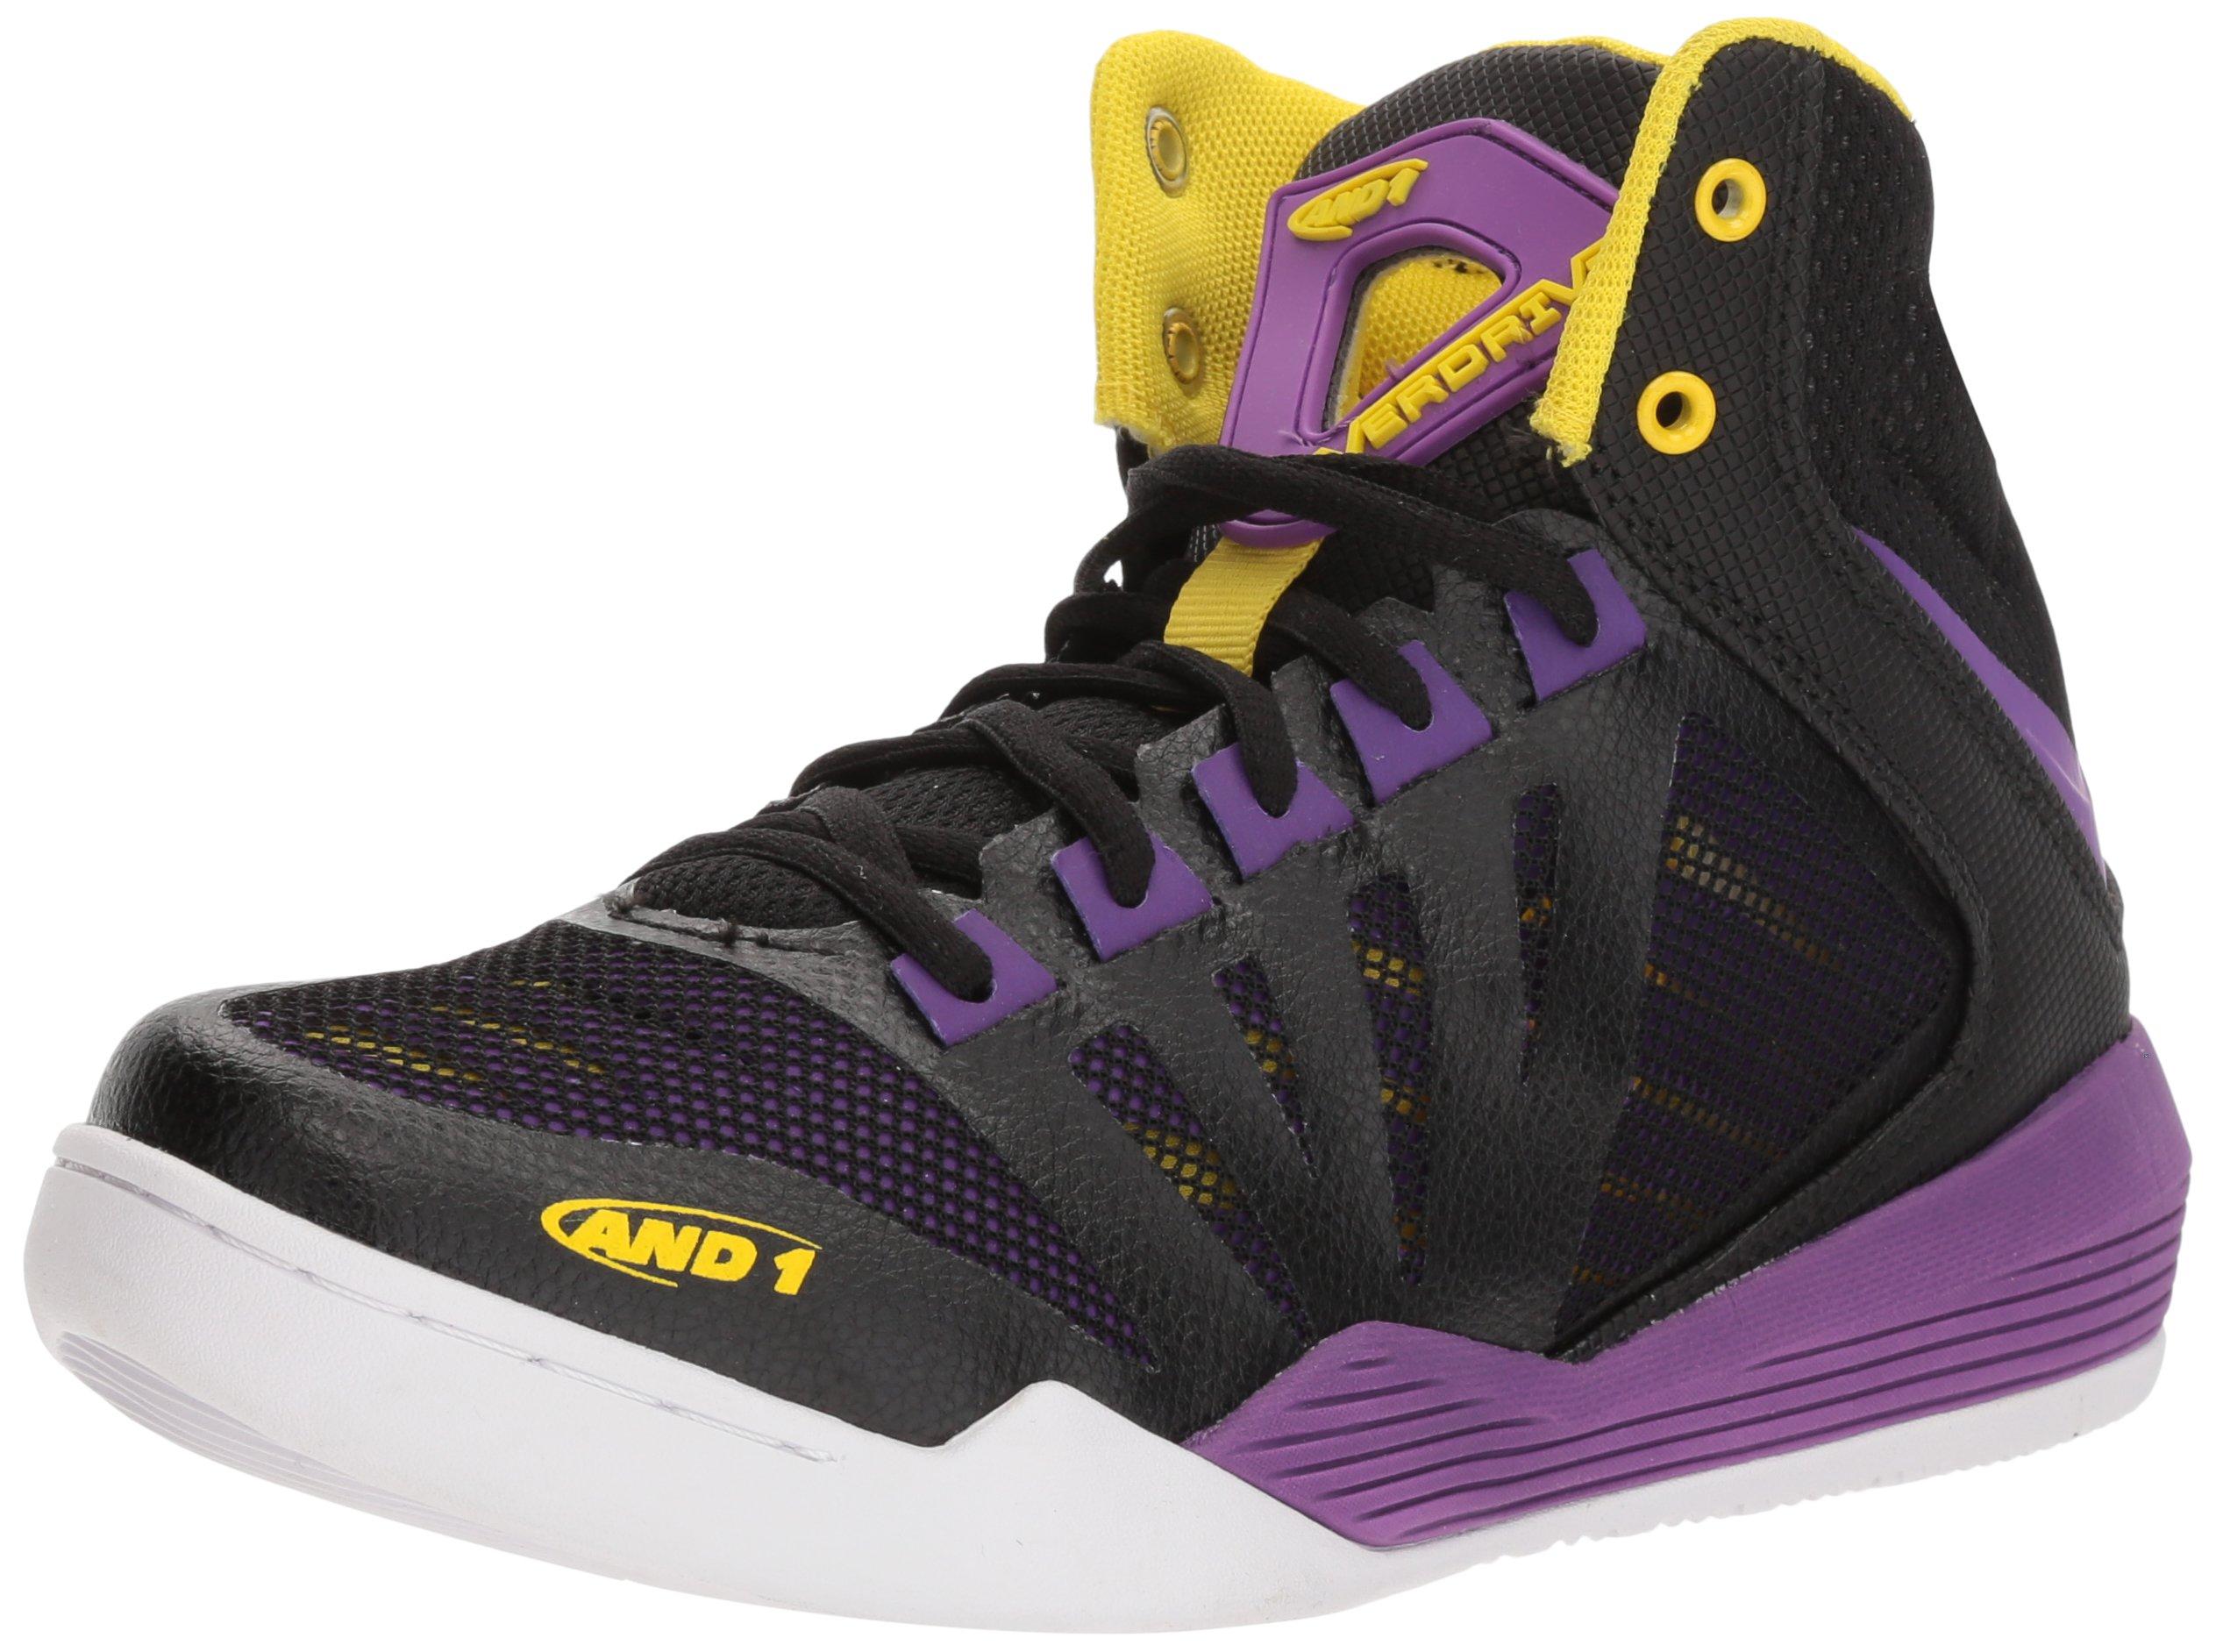 AND1 Women's Overdrive Basketball Shoe, Black/Amaranth Purple/Vibrant Yellow, 8 M US